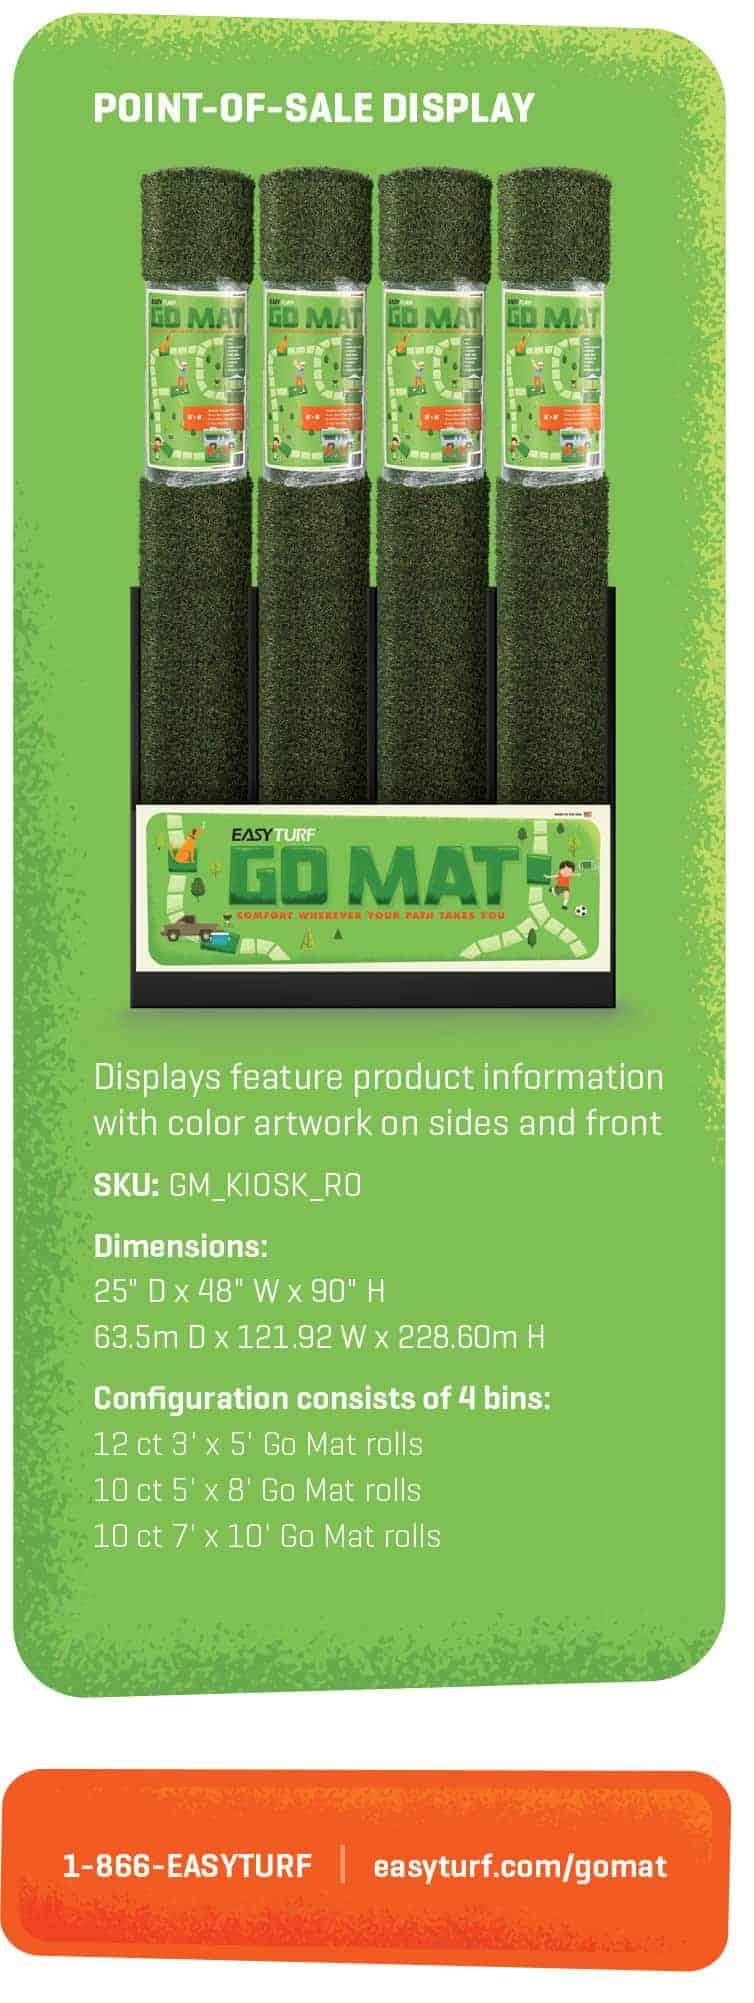 gomat_display